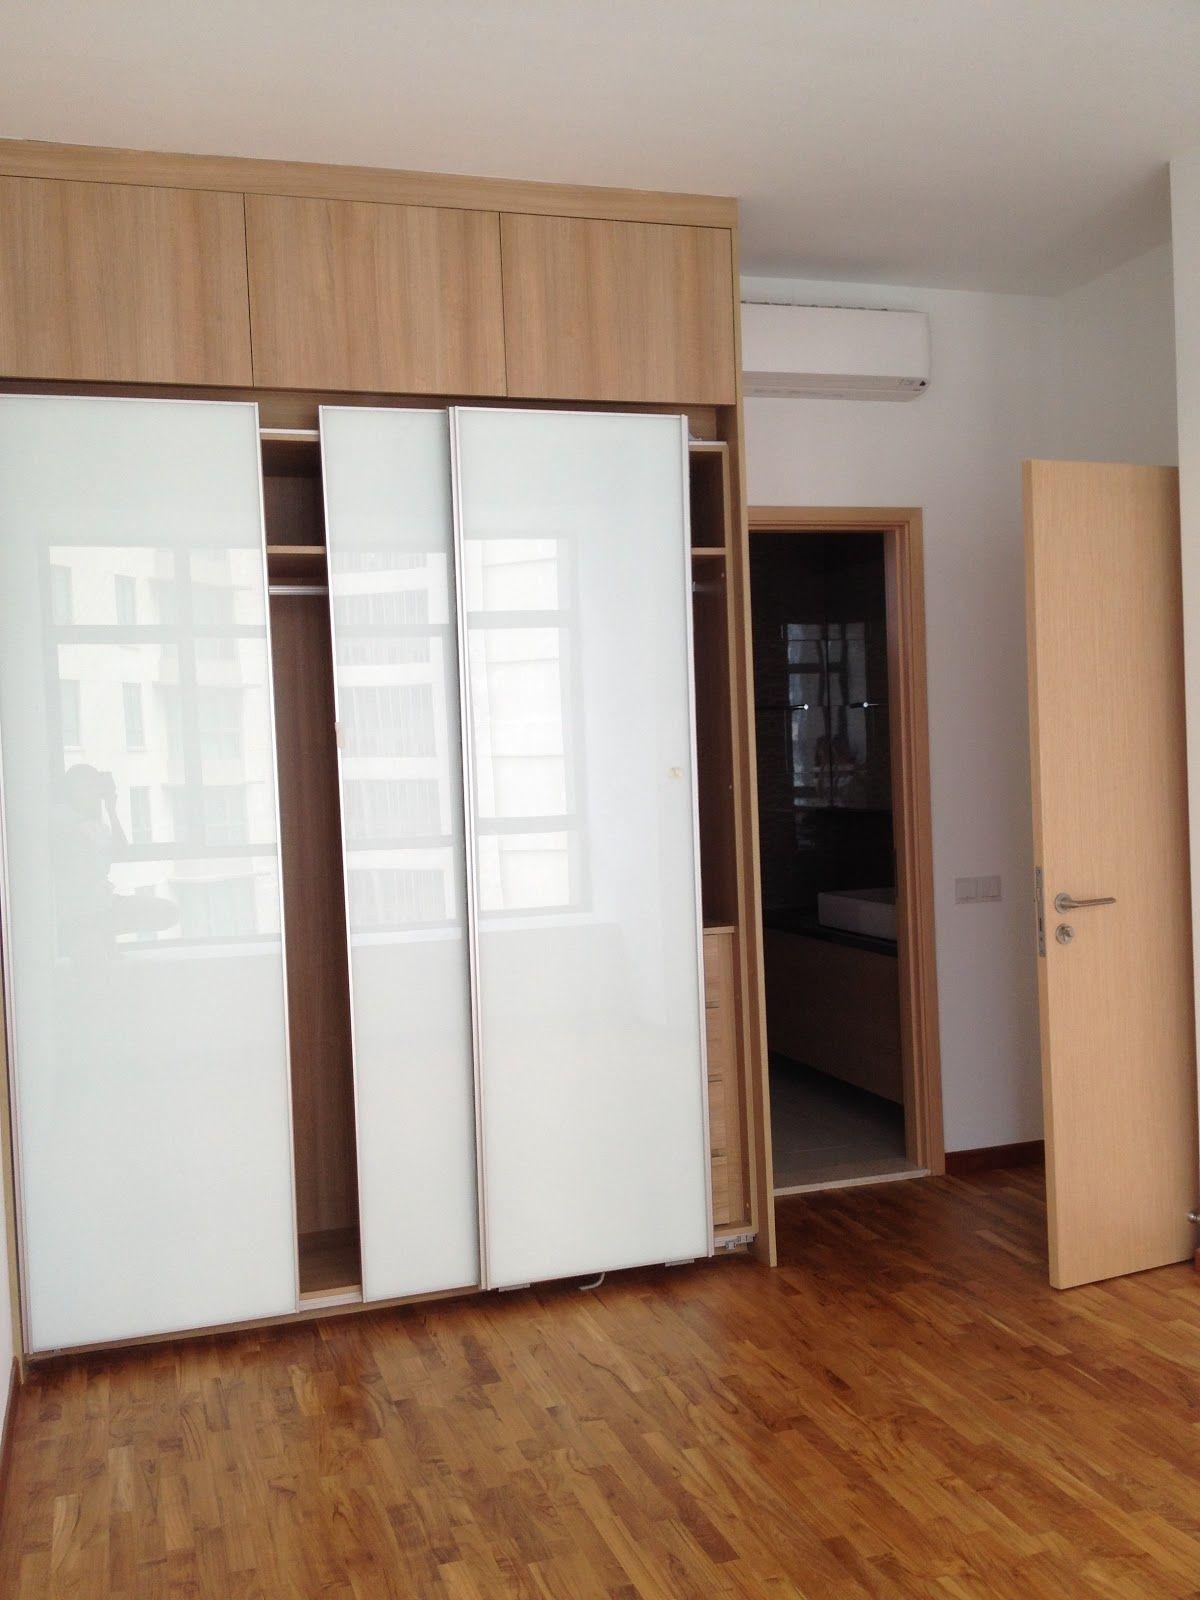 Glorious White Glozzy Sliding Doors Built In Wardrobe On